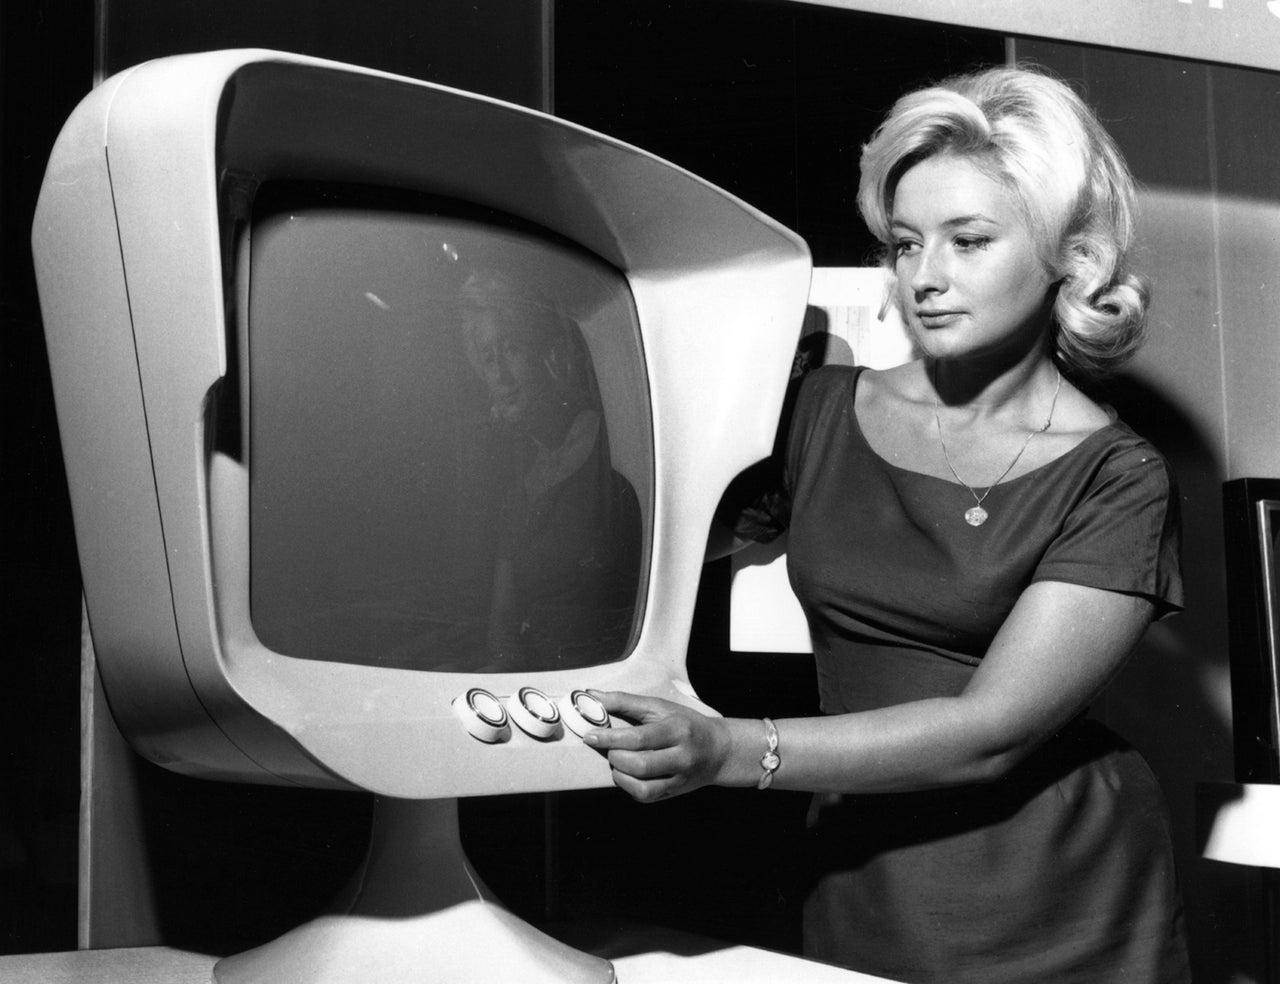 This Sleek TV of the Future Predates The Jetsons